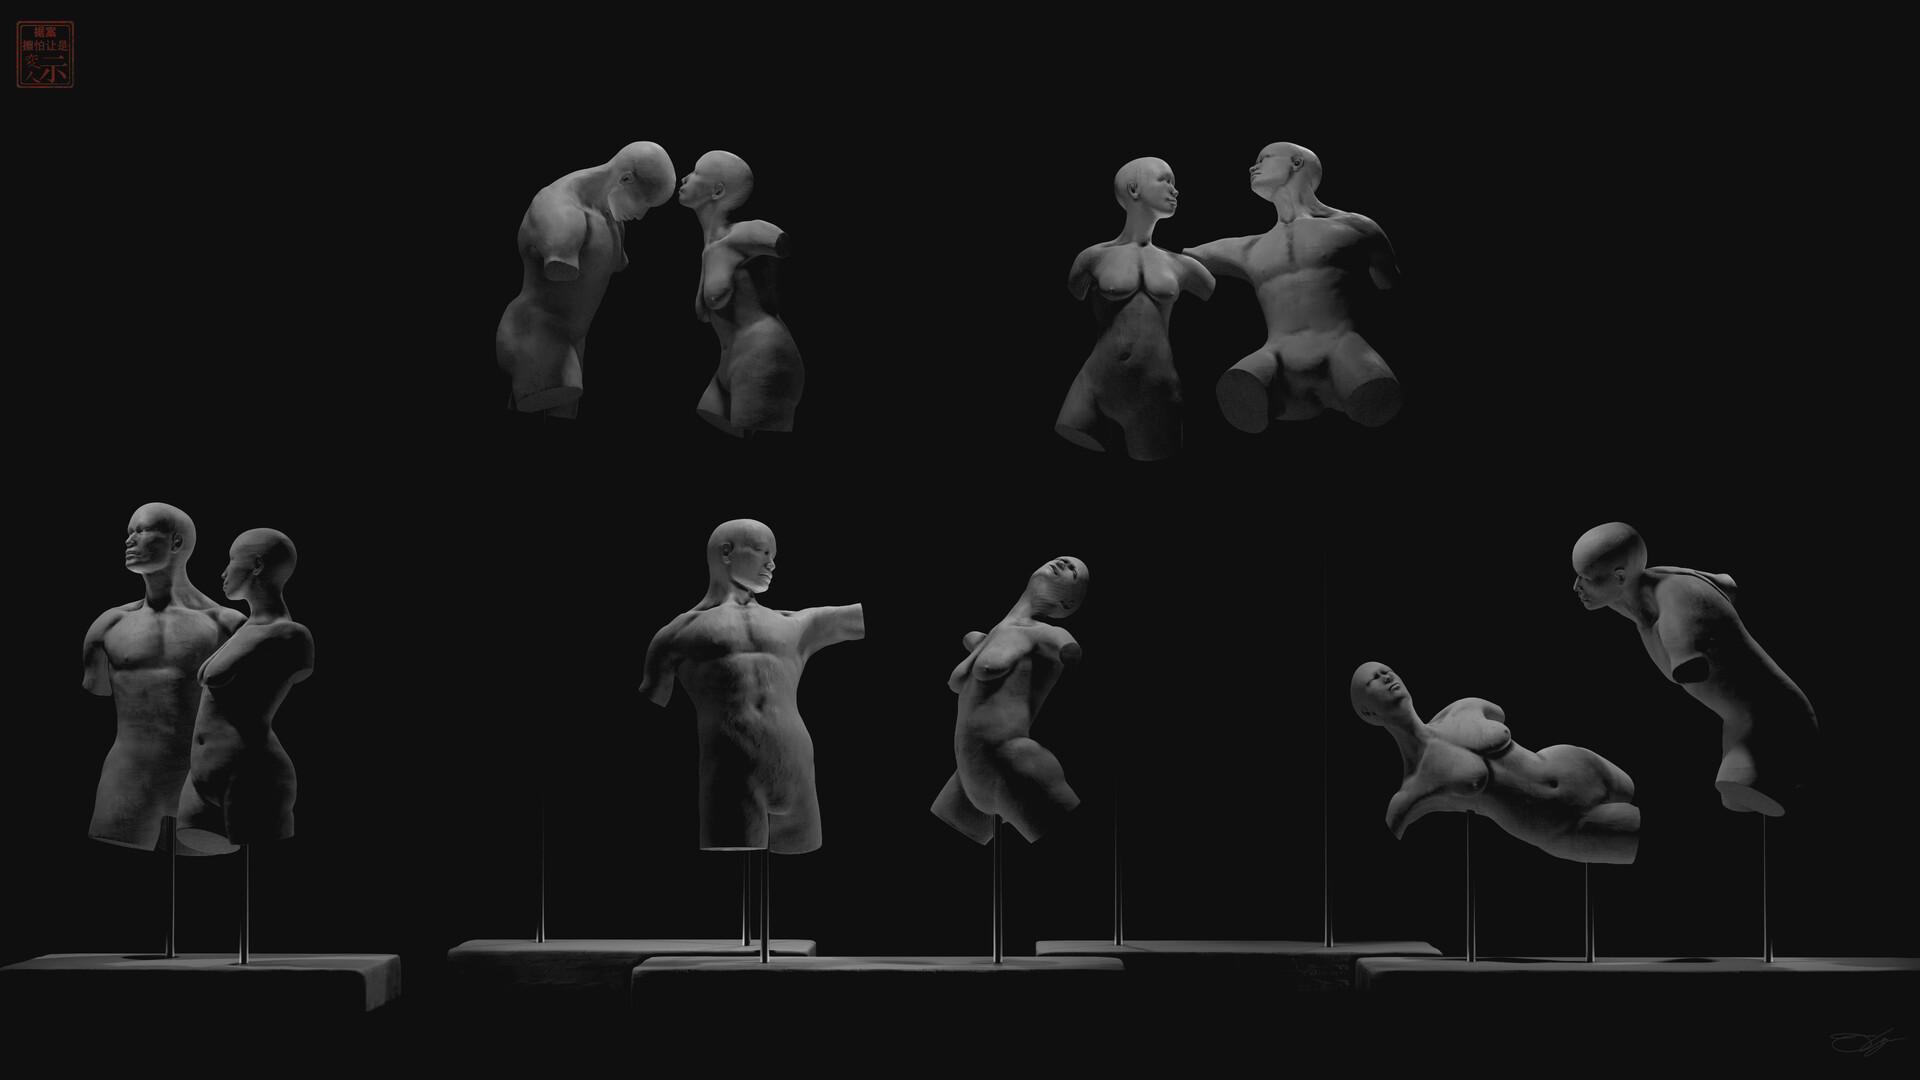 Torso Body Language & Movement Study